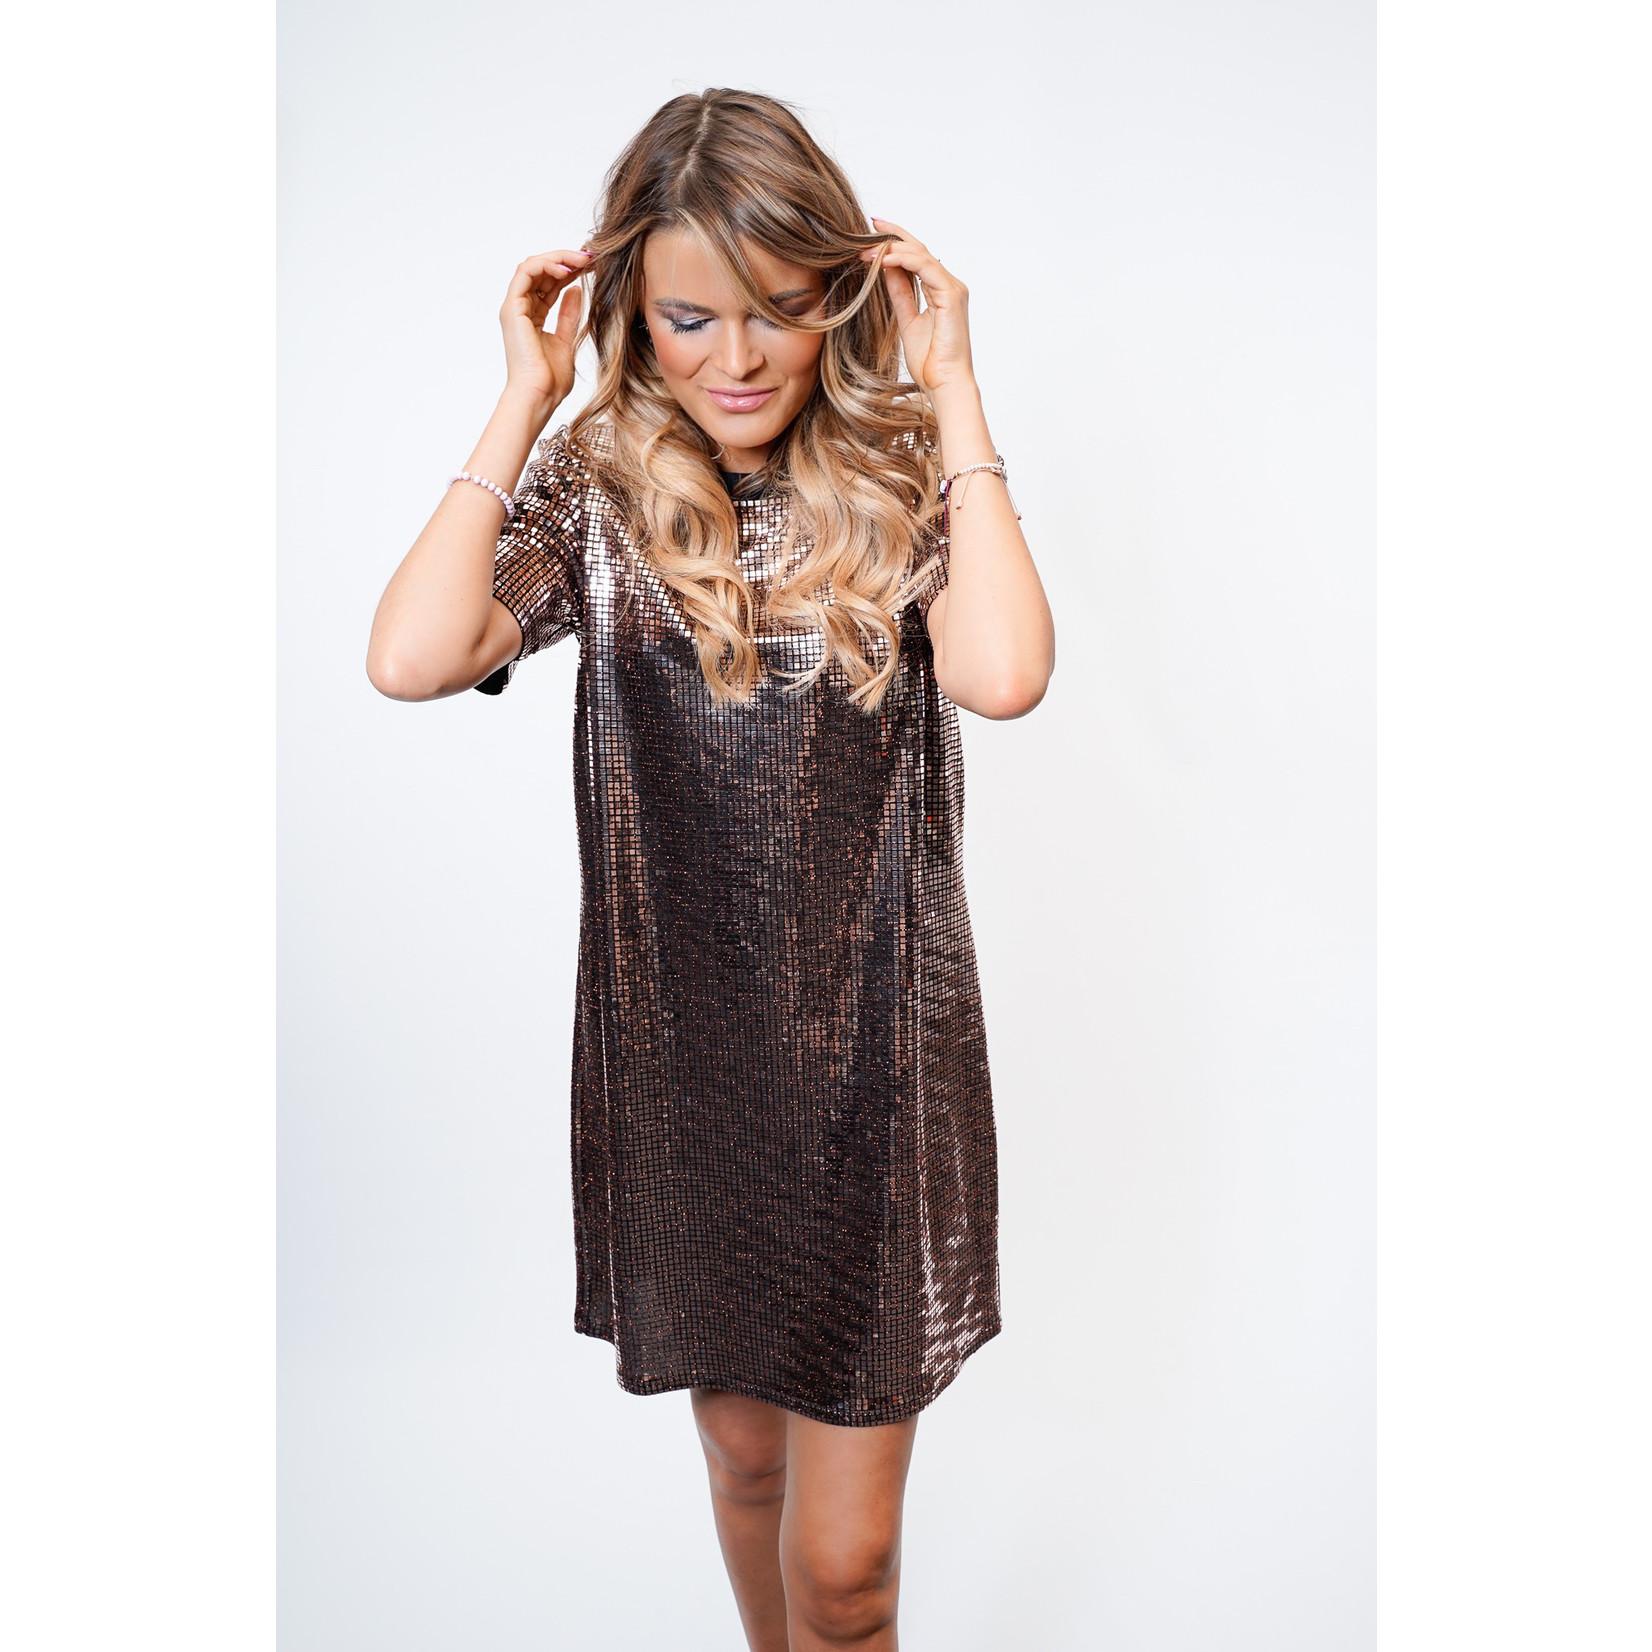 Yentl K Glitter Dress 34